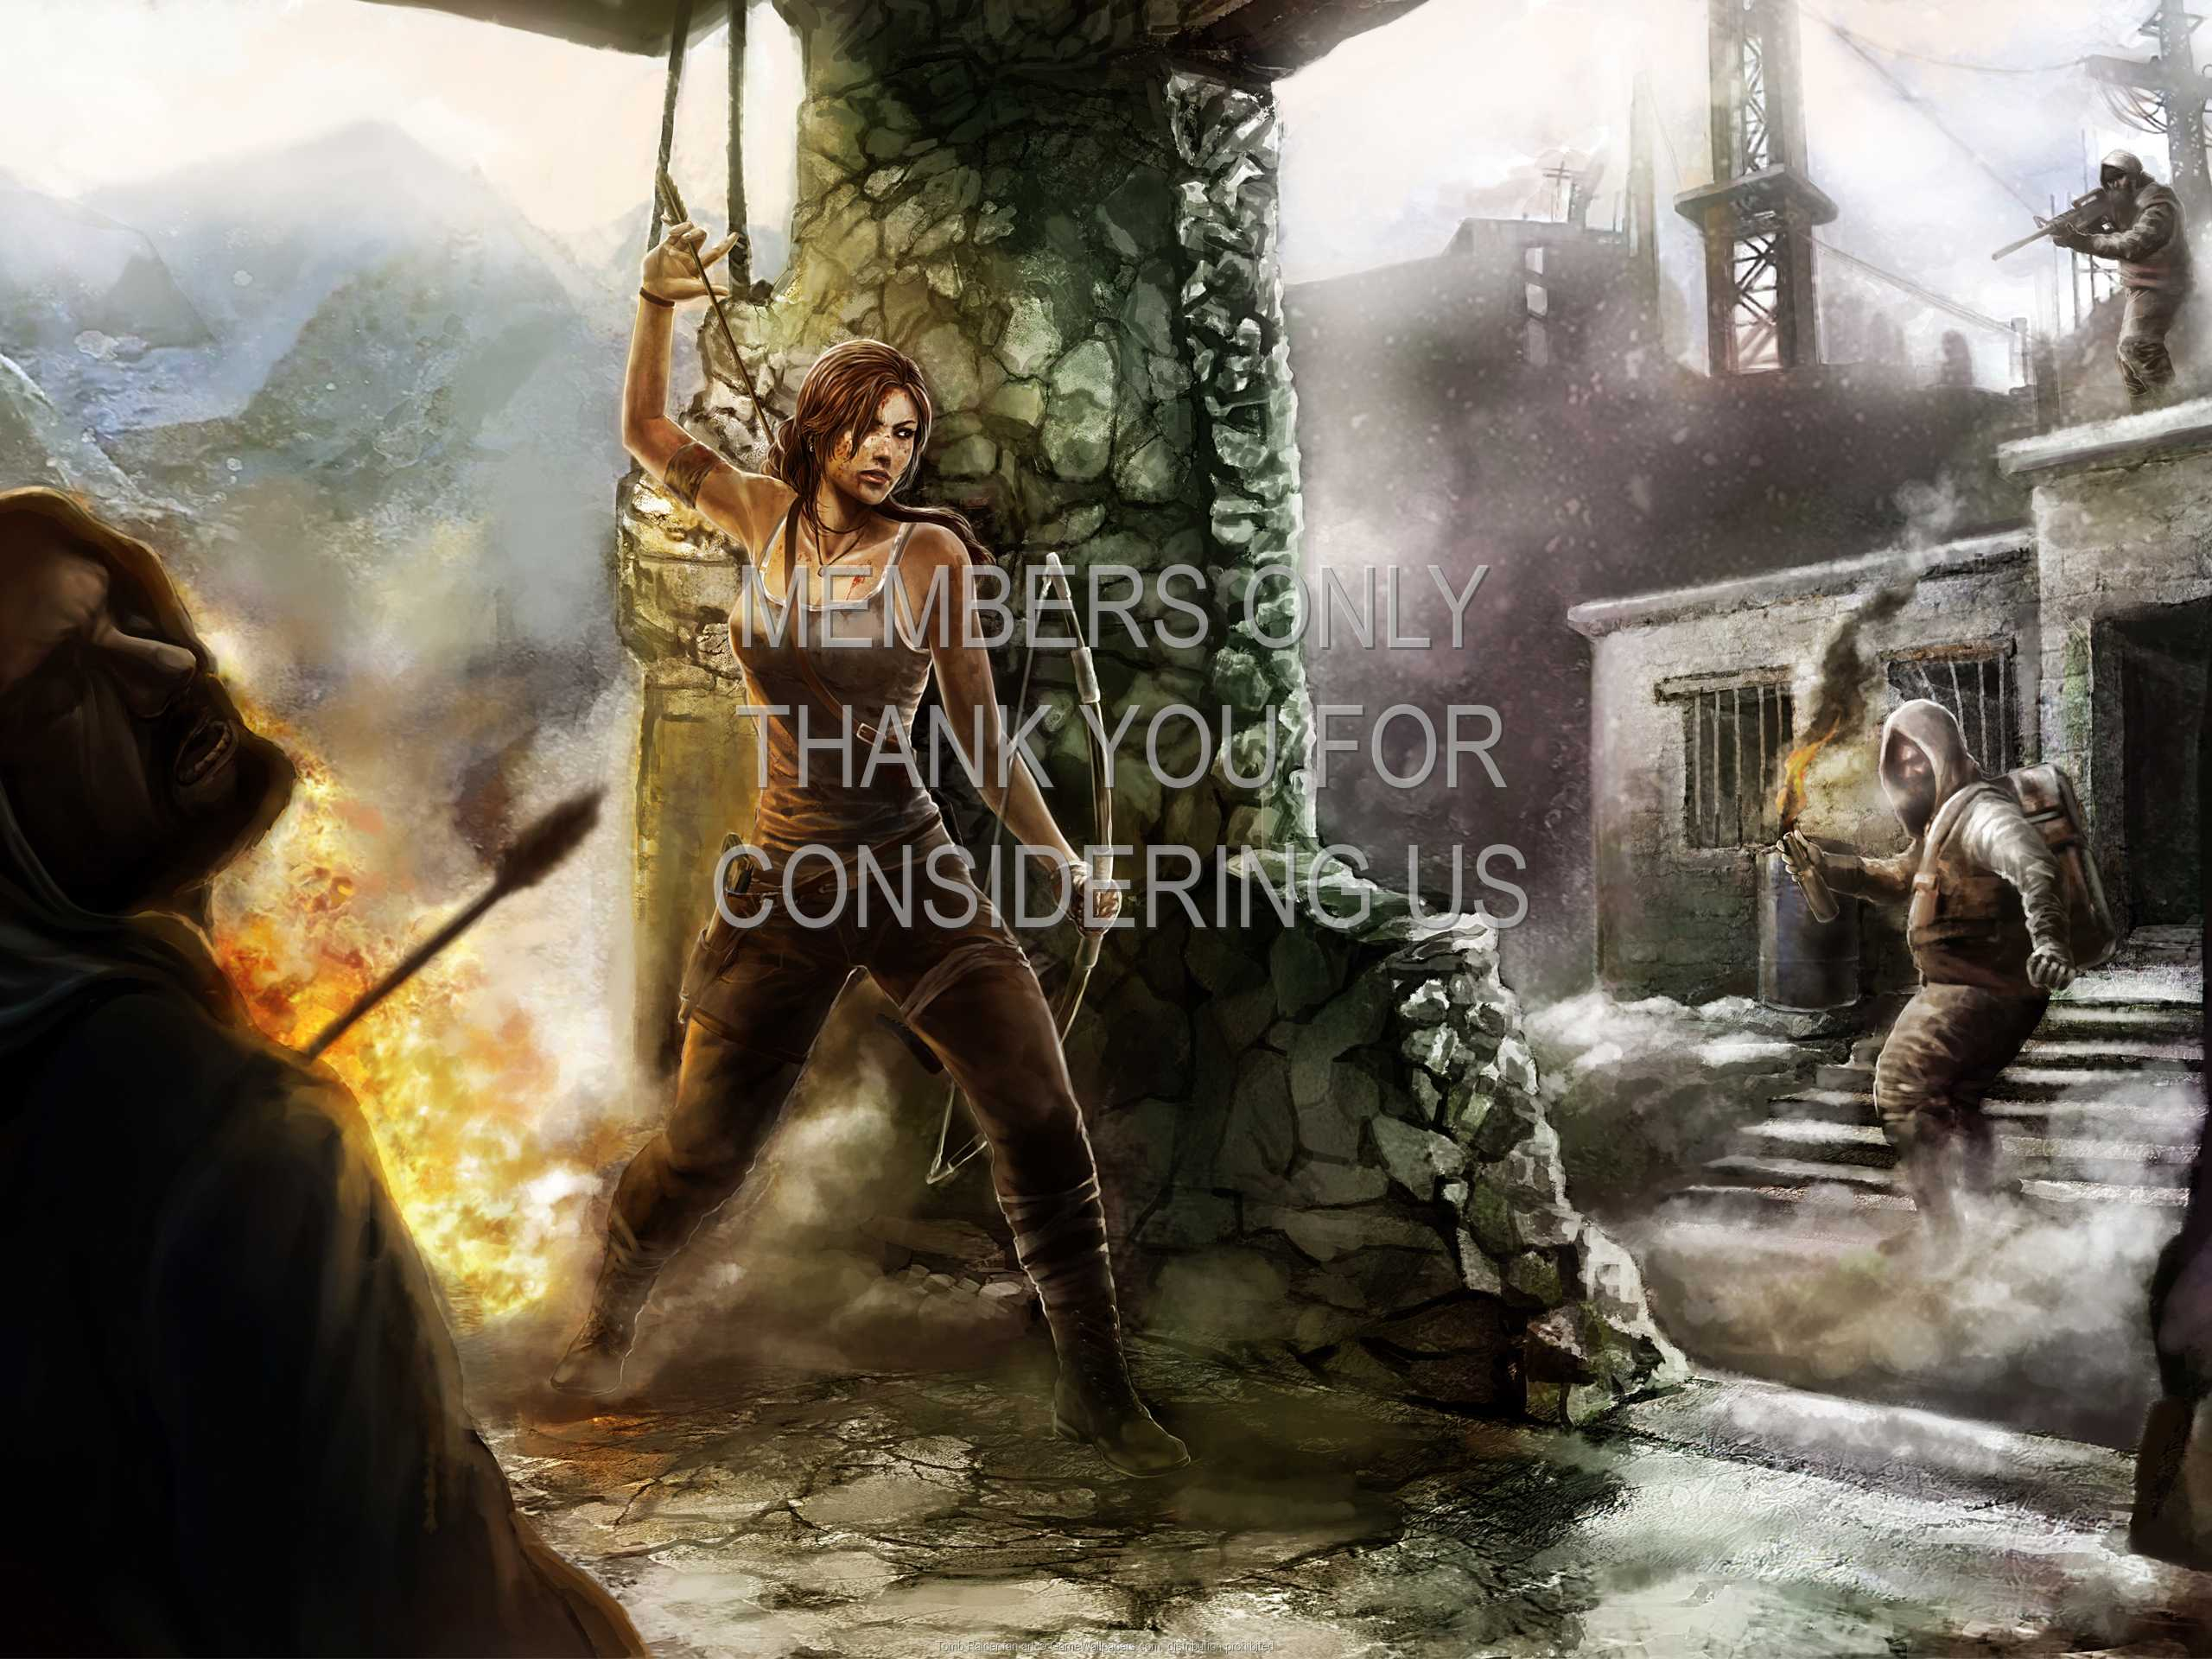 Tomb Raider fan art 1080p Horizontal Handy Hintergrundbild 02